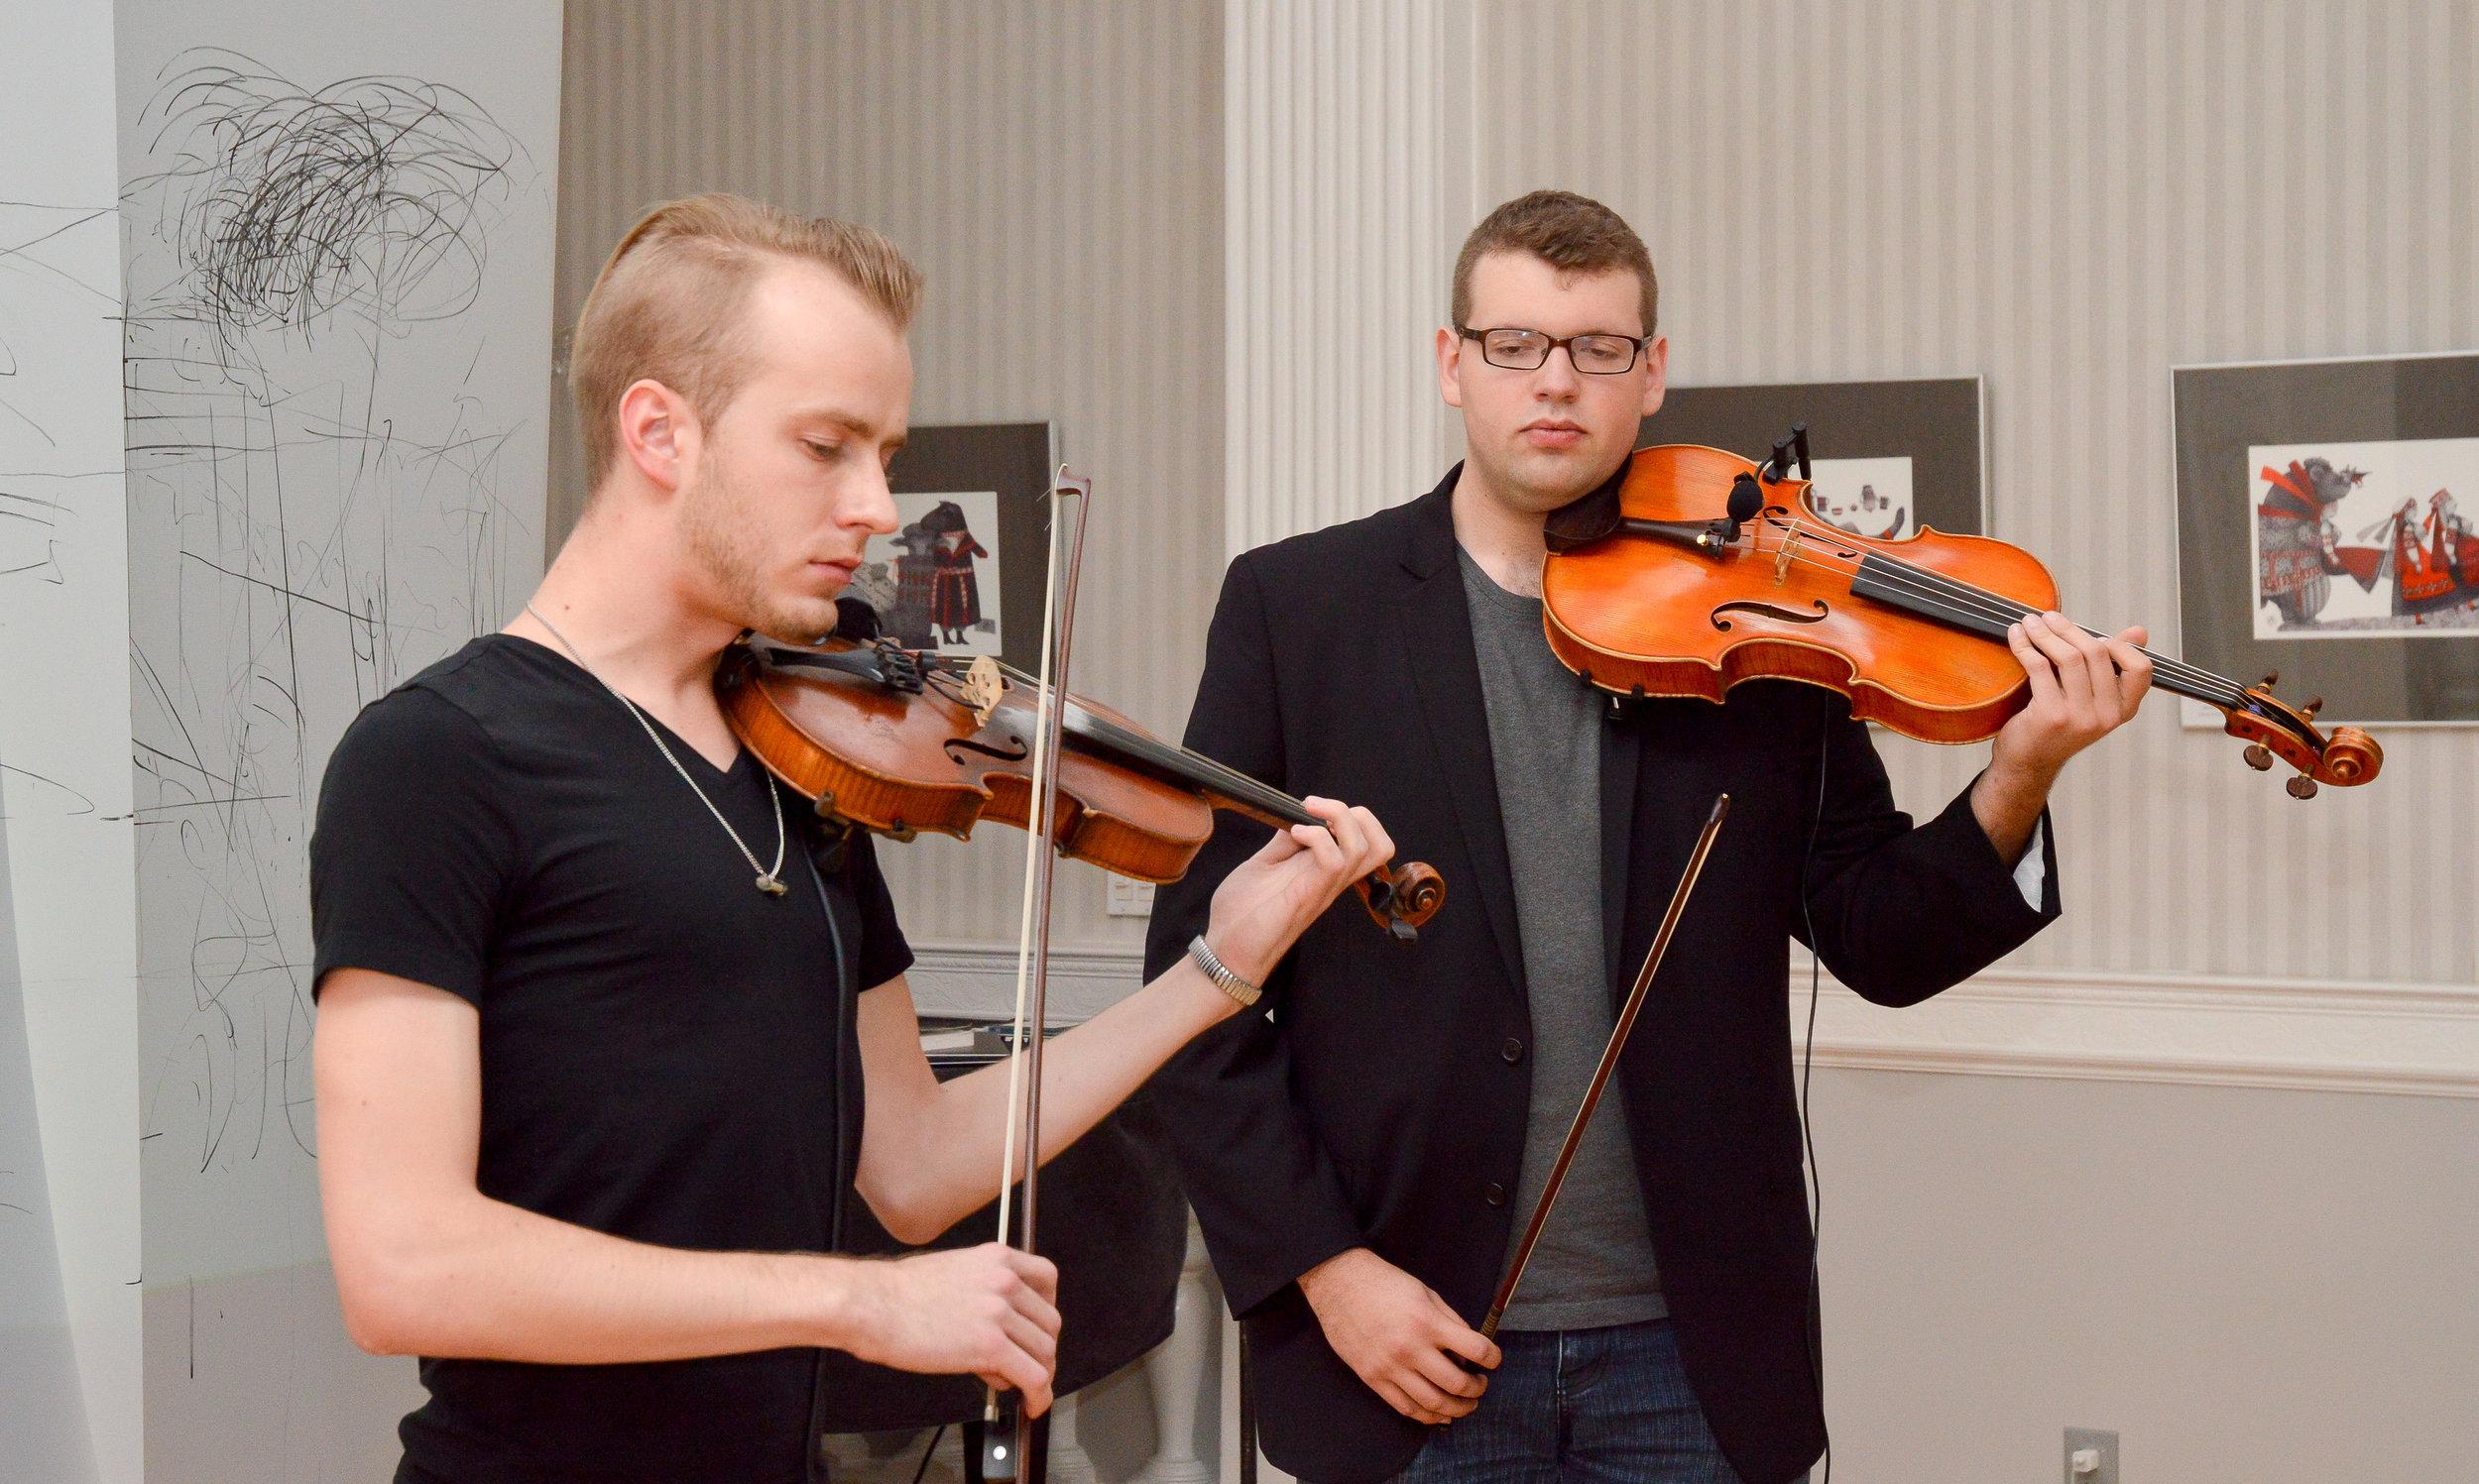 Valev Laube & Evan Basta - Performance 2